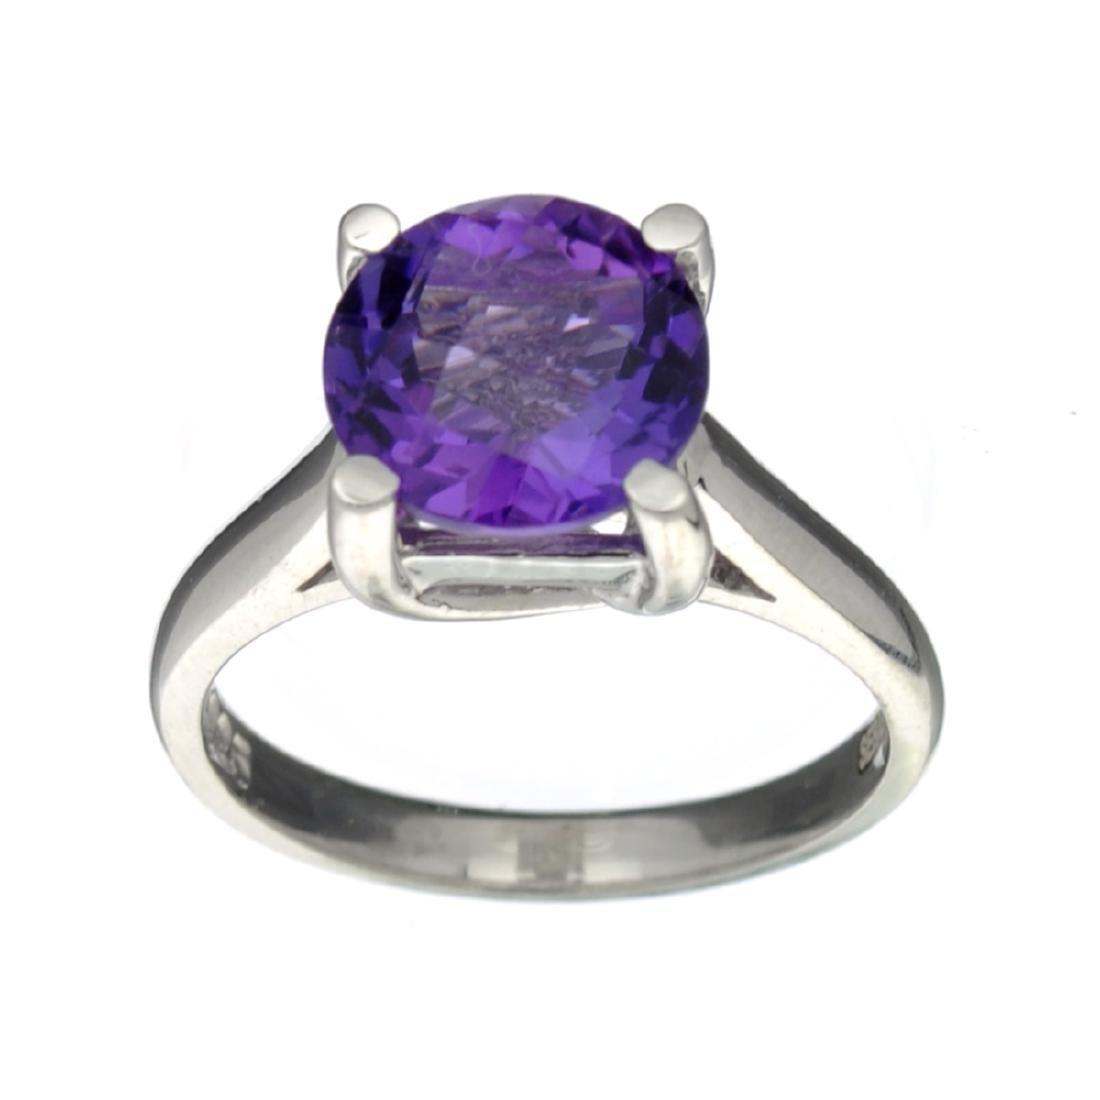 APP: 0.5k Fine Jewelry Designer Sebastian, 2.43CT Round